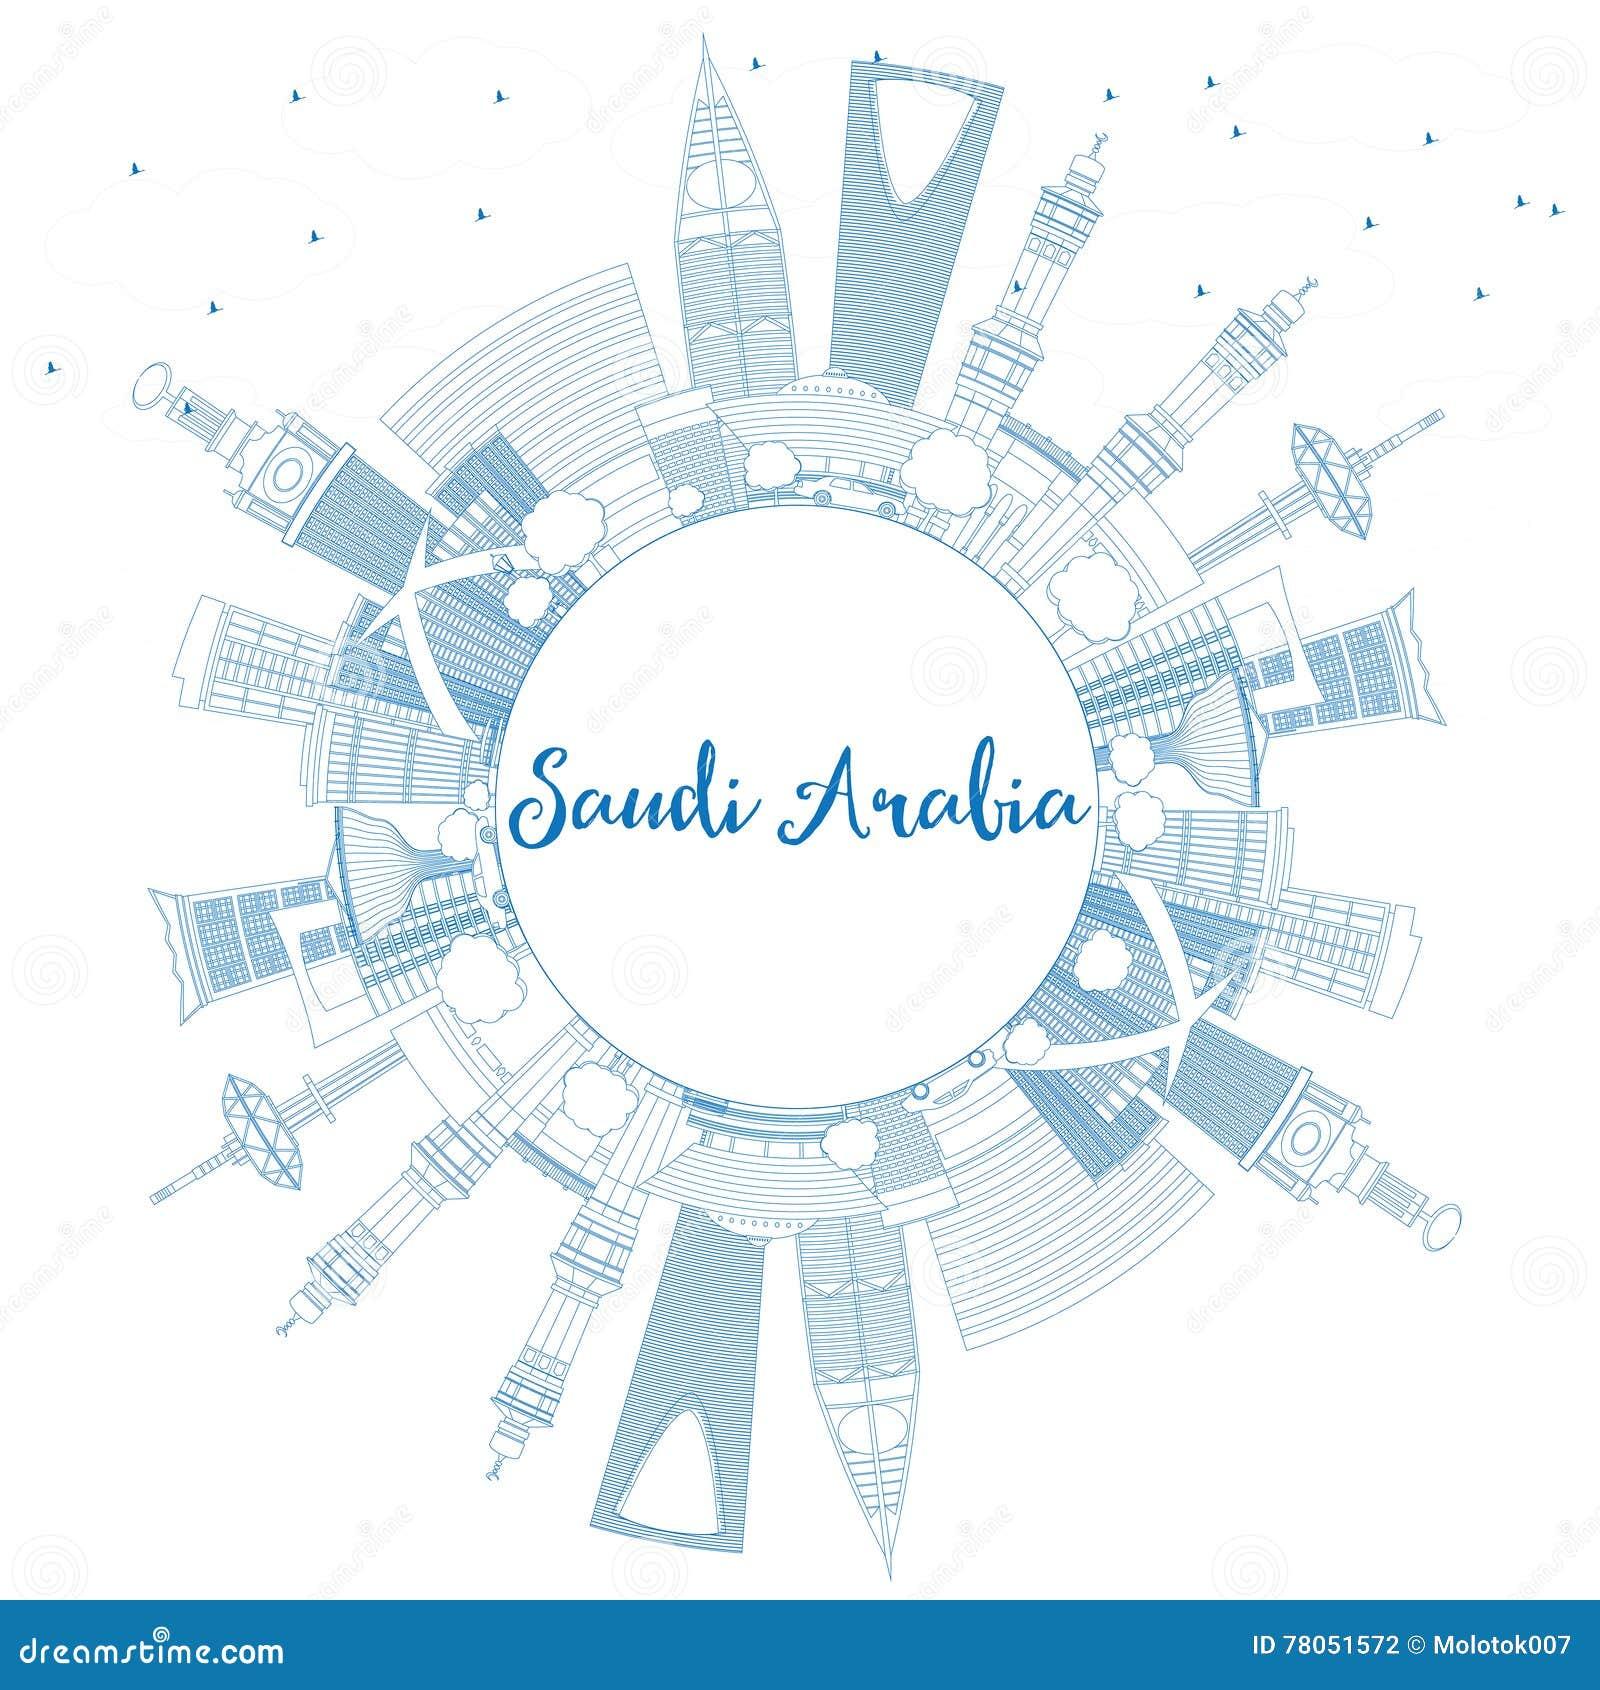 UN Committee against Torture: Review of Saudi Arabia